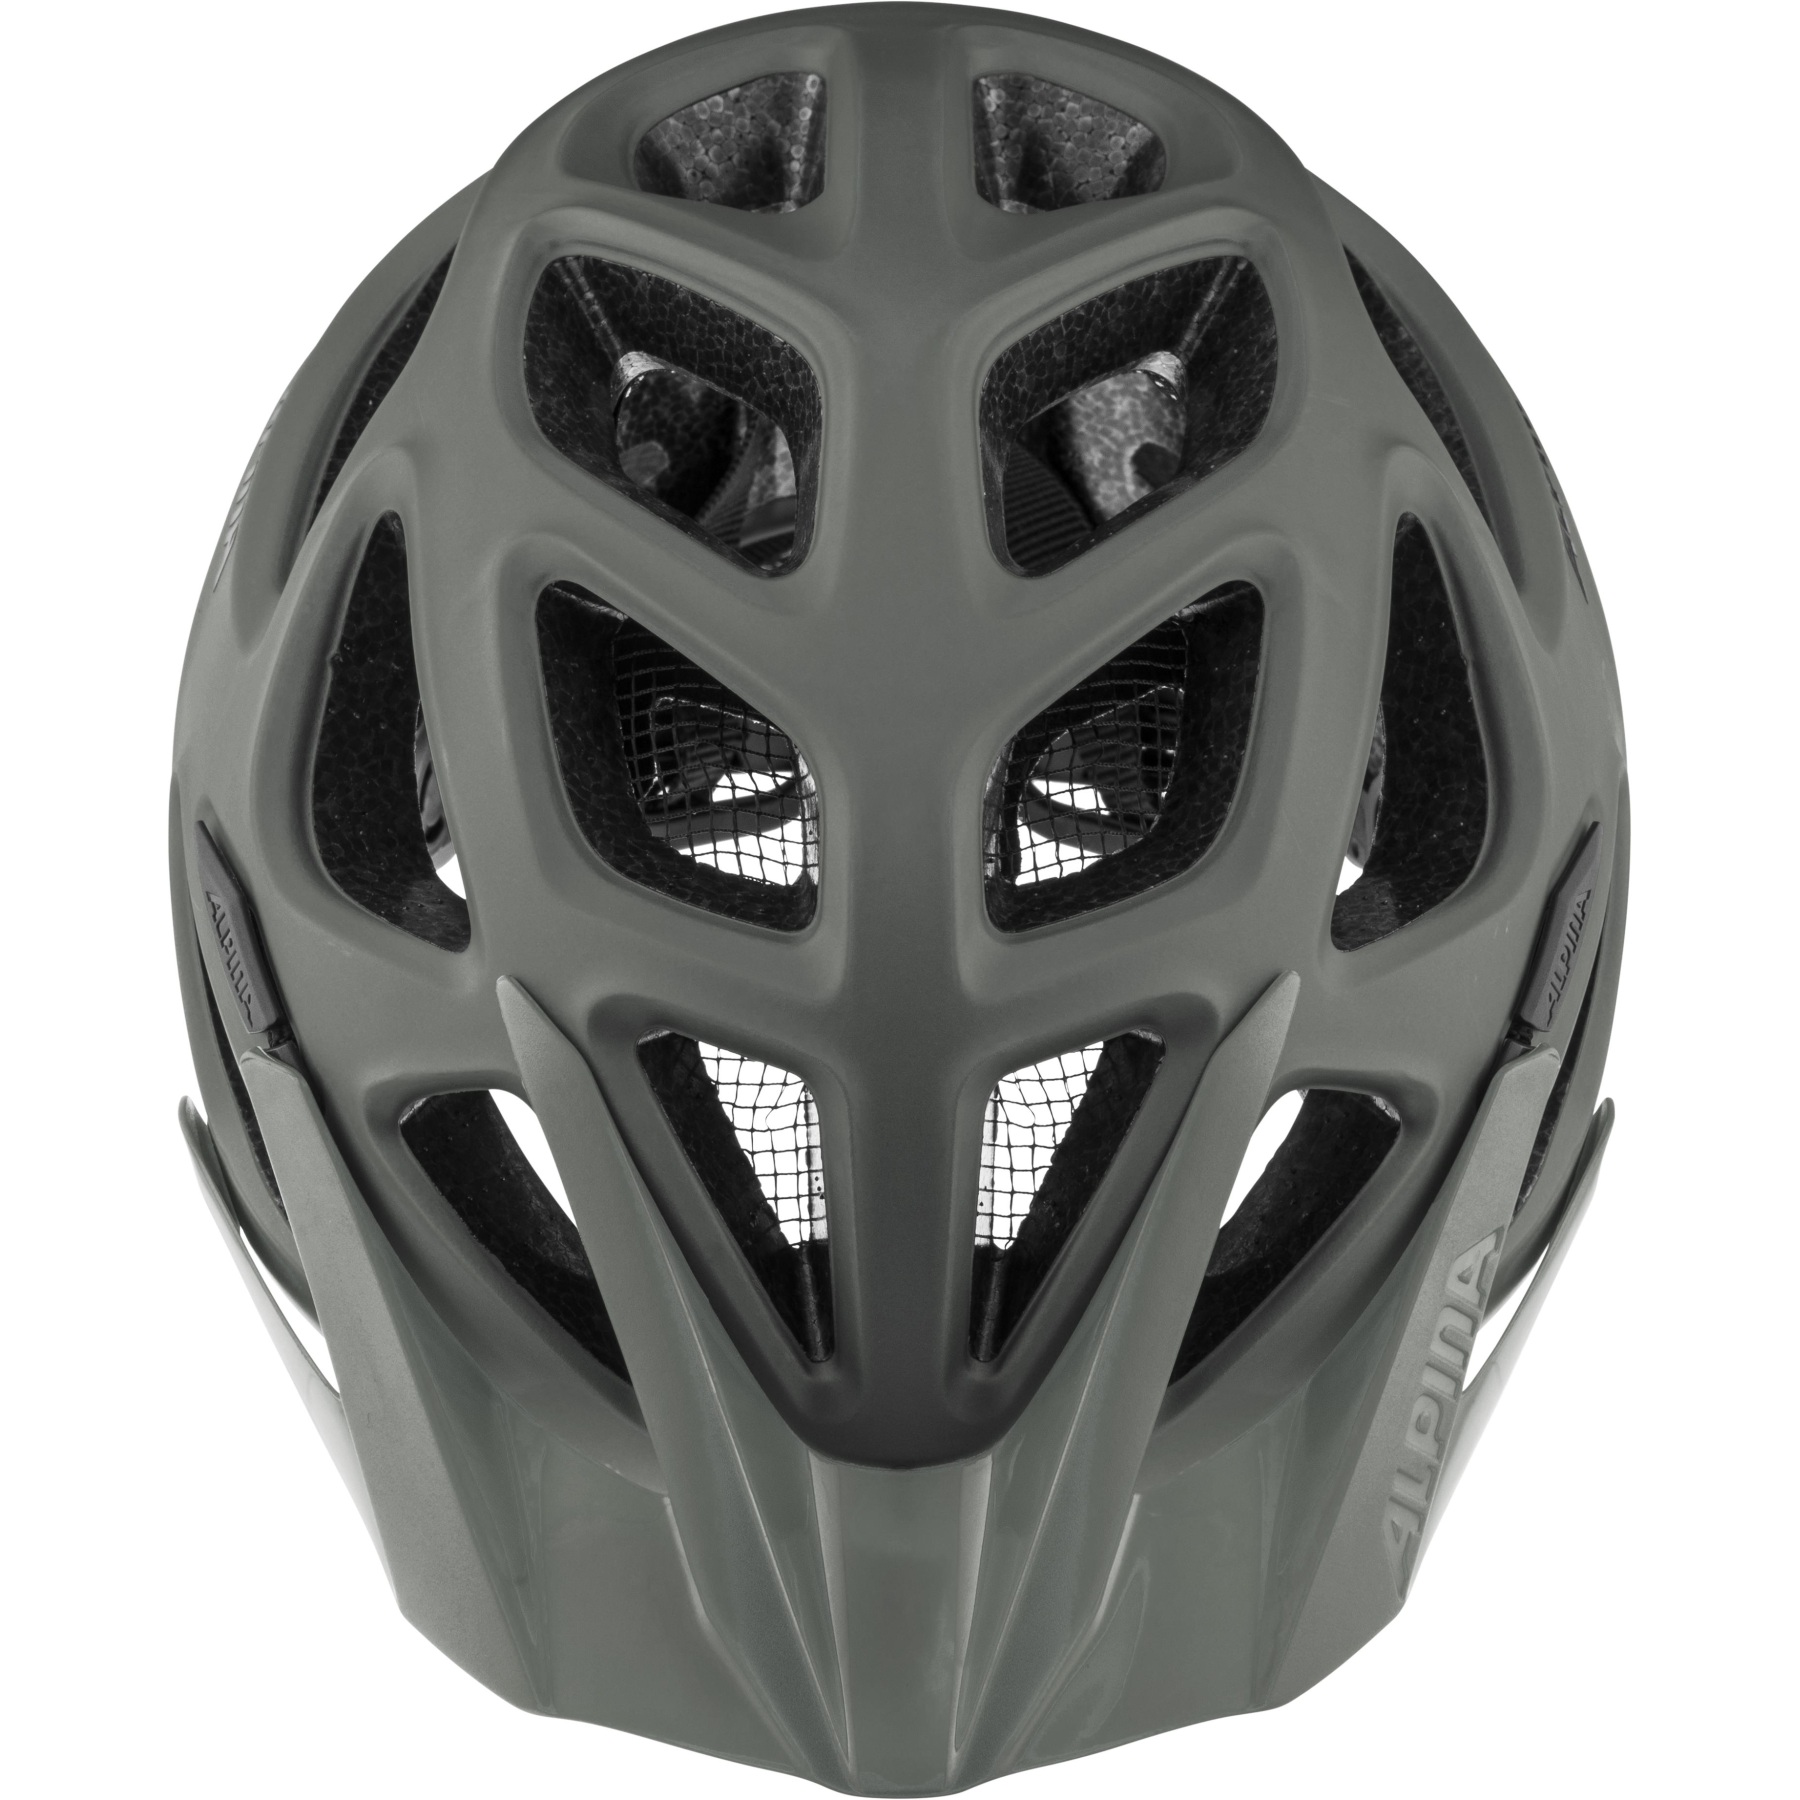 Image of Alpina Mythos 3.0 L.E. Helmet - coffee-grey matt